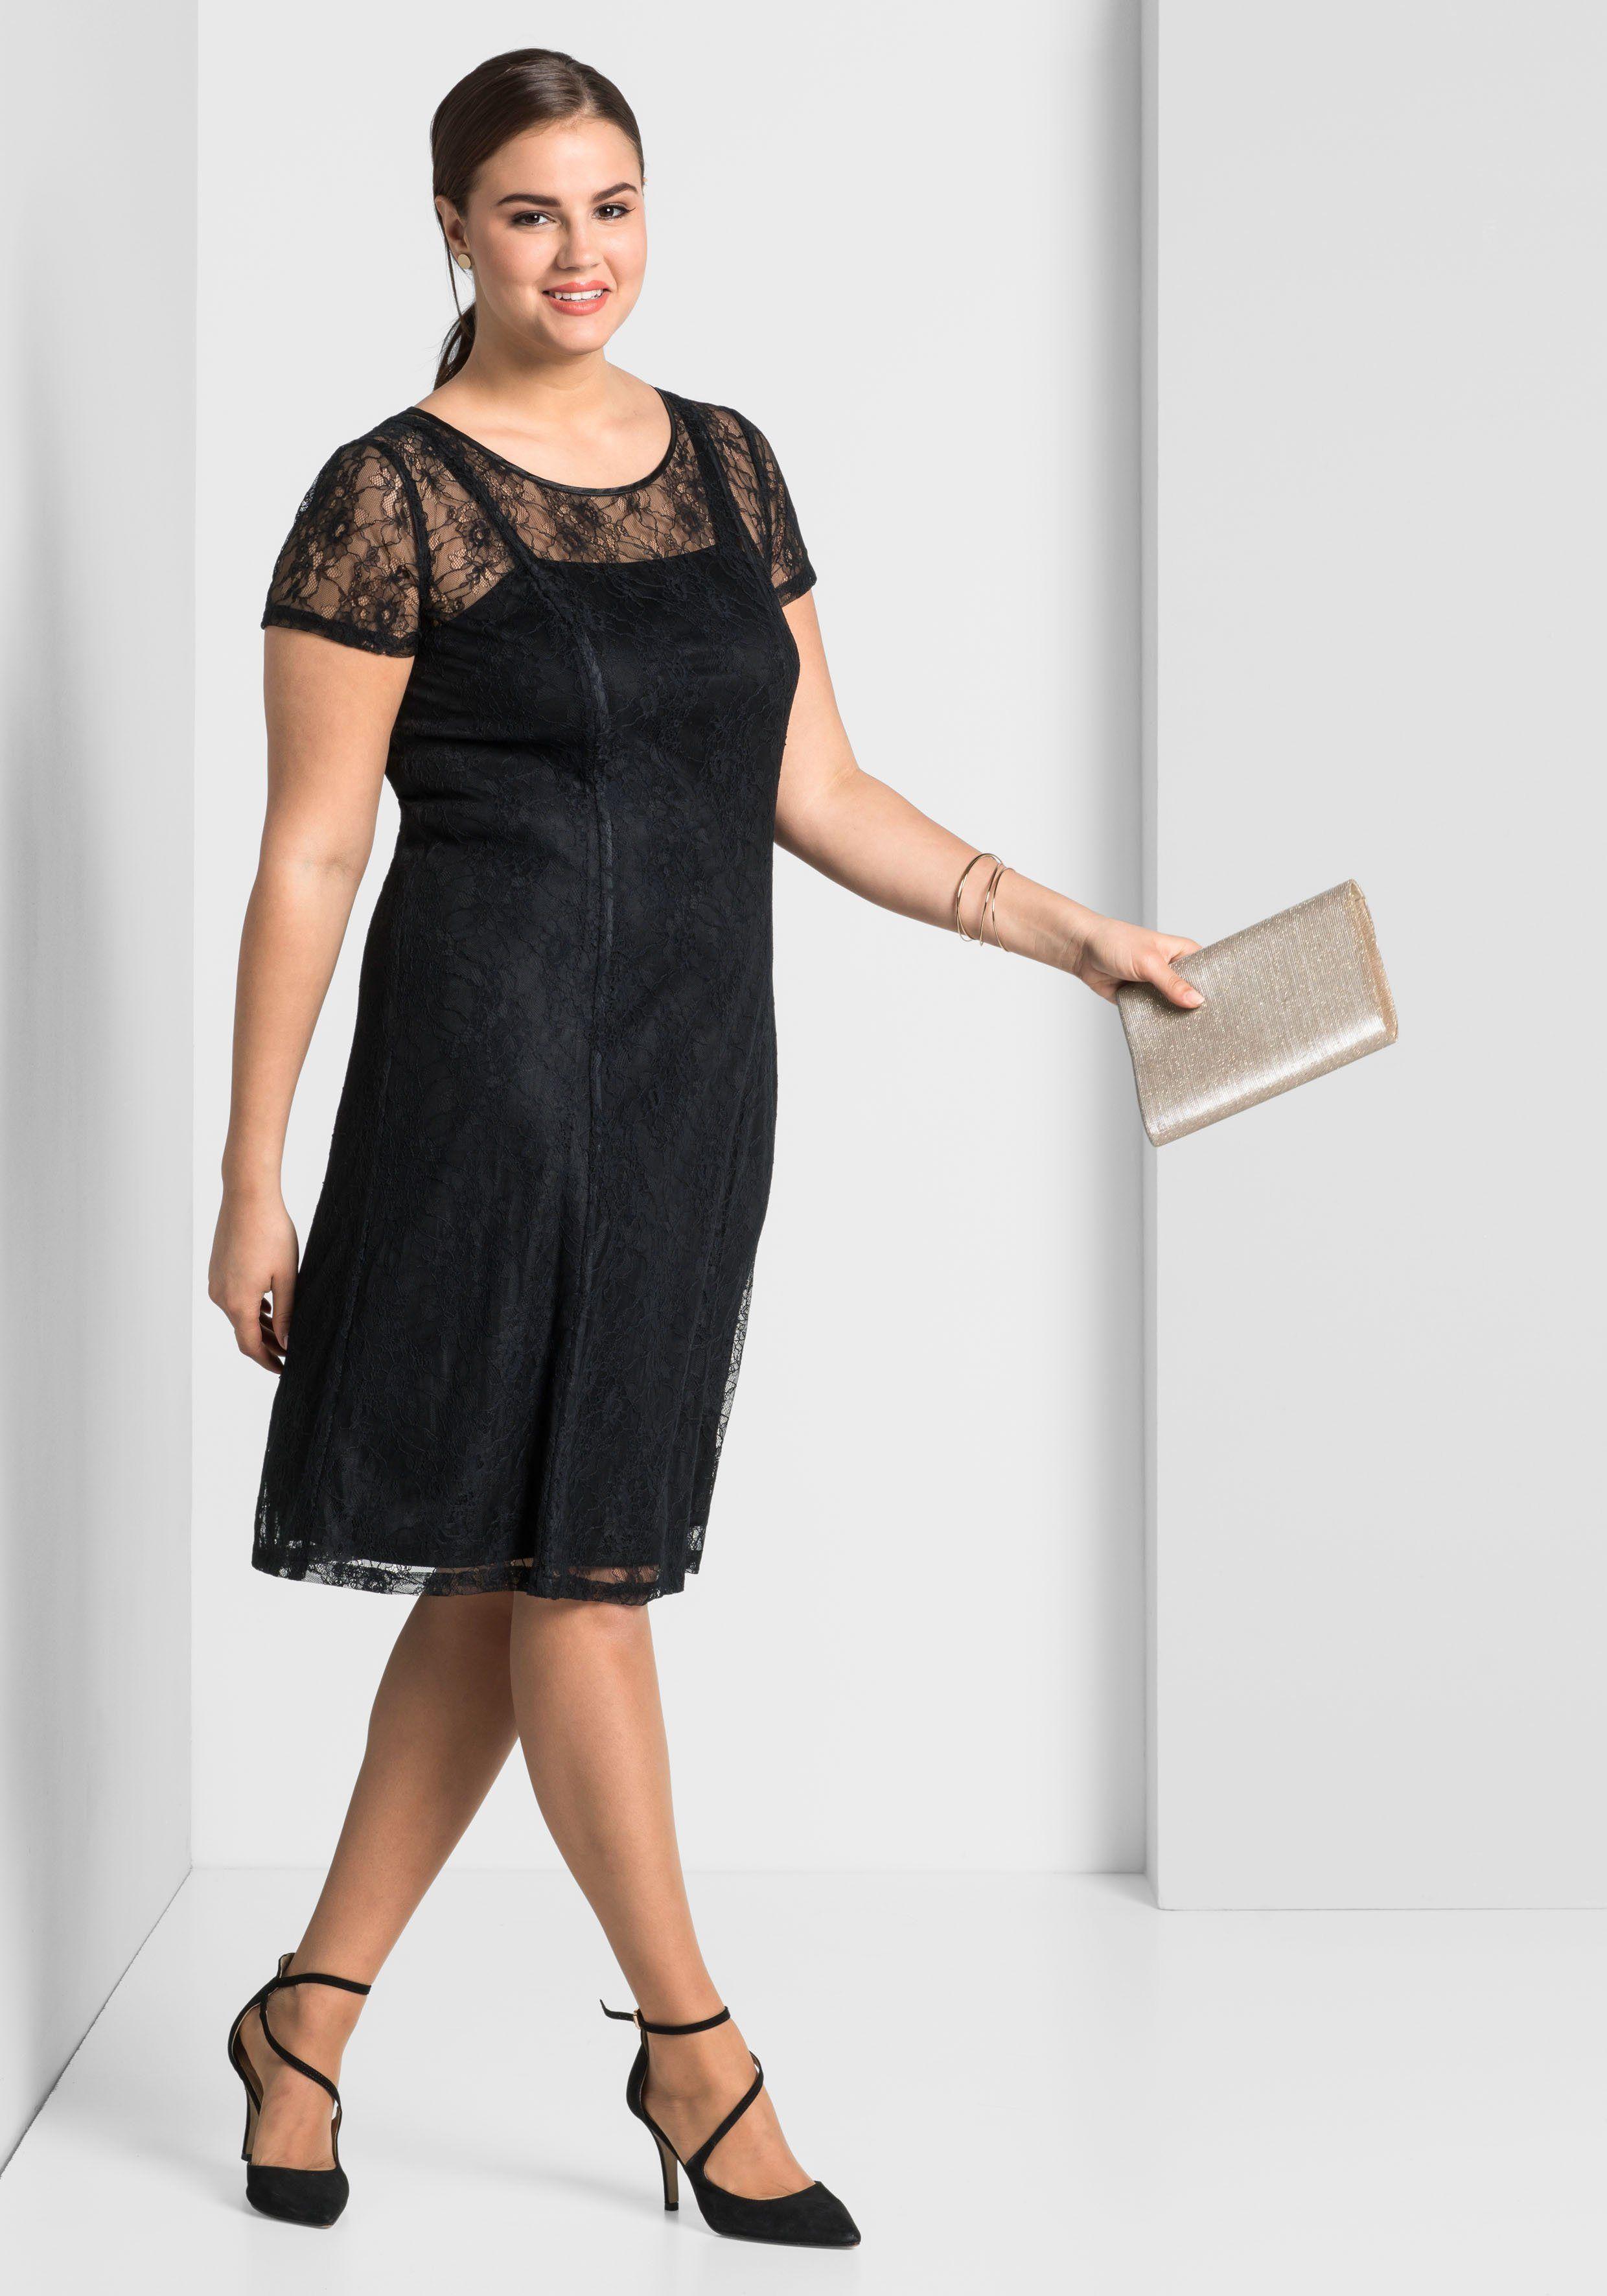 sheego Style Cocktailkleid Jetzt bestellen unter   https   mode.ladendirekt.de 4cfabdb622